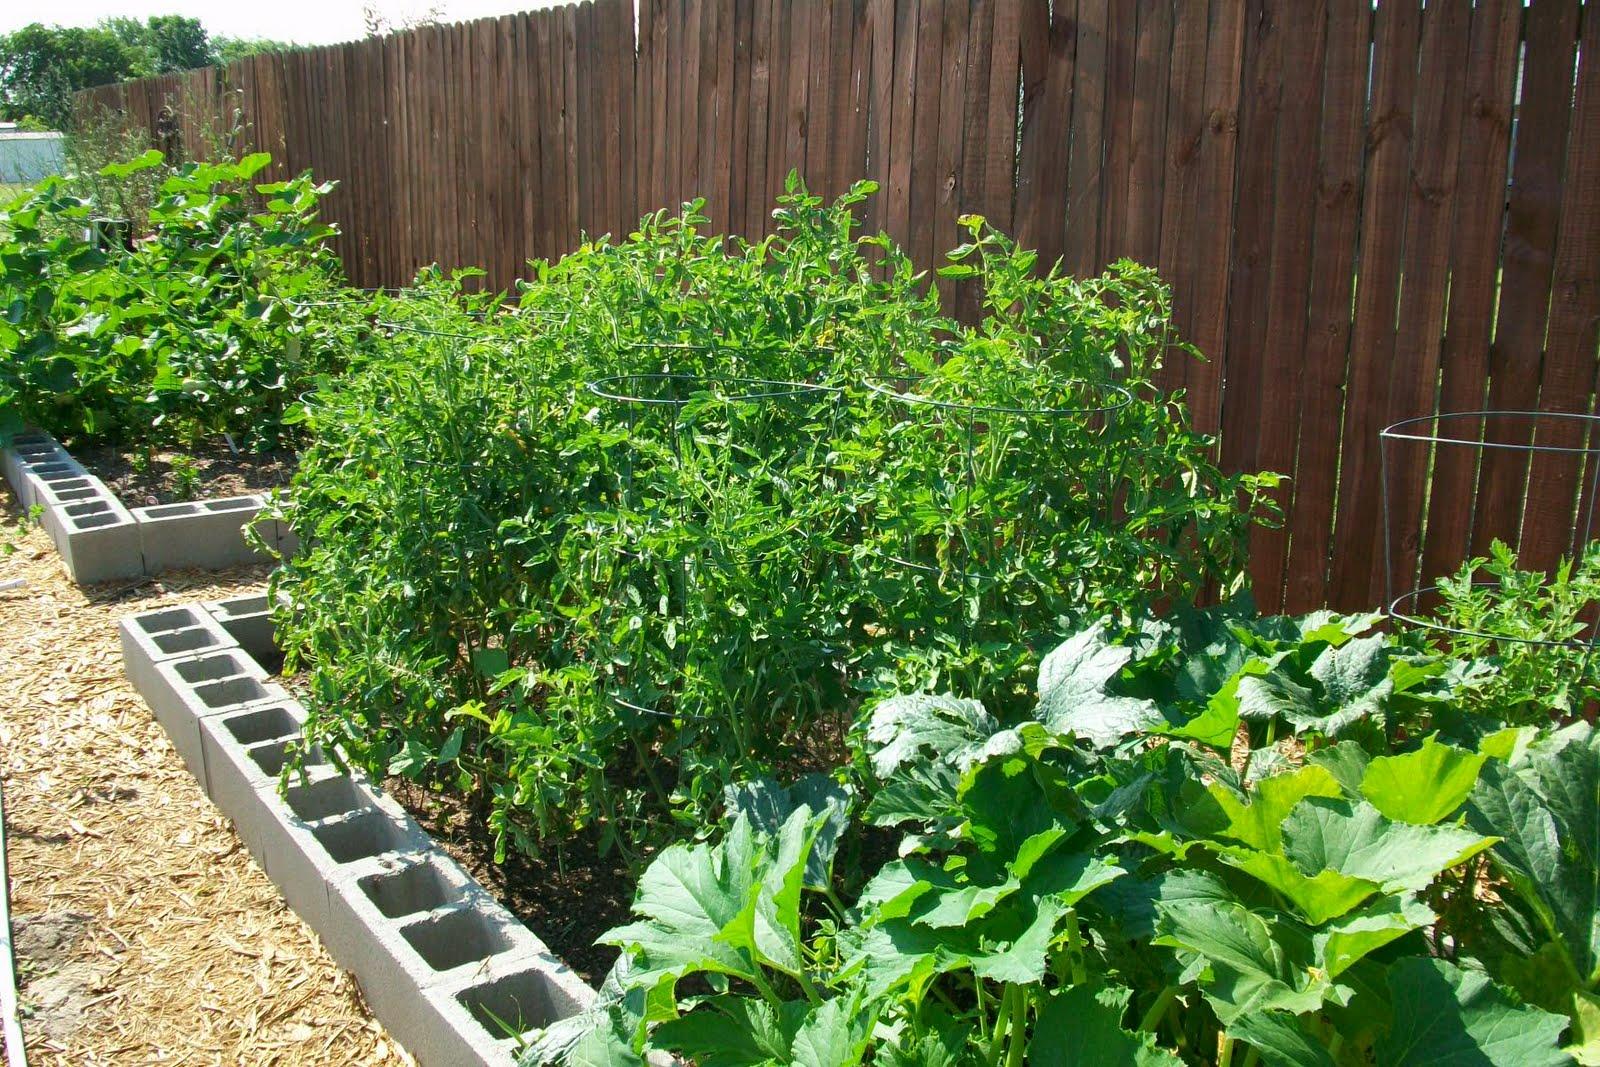 Gardening in texas for beginners